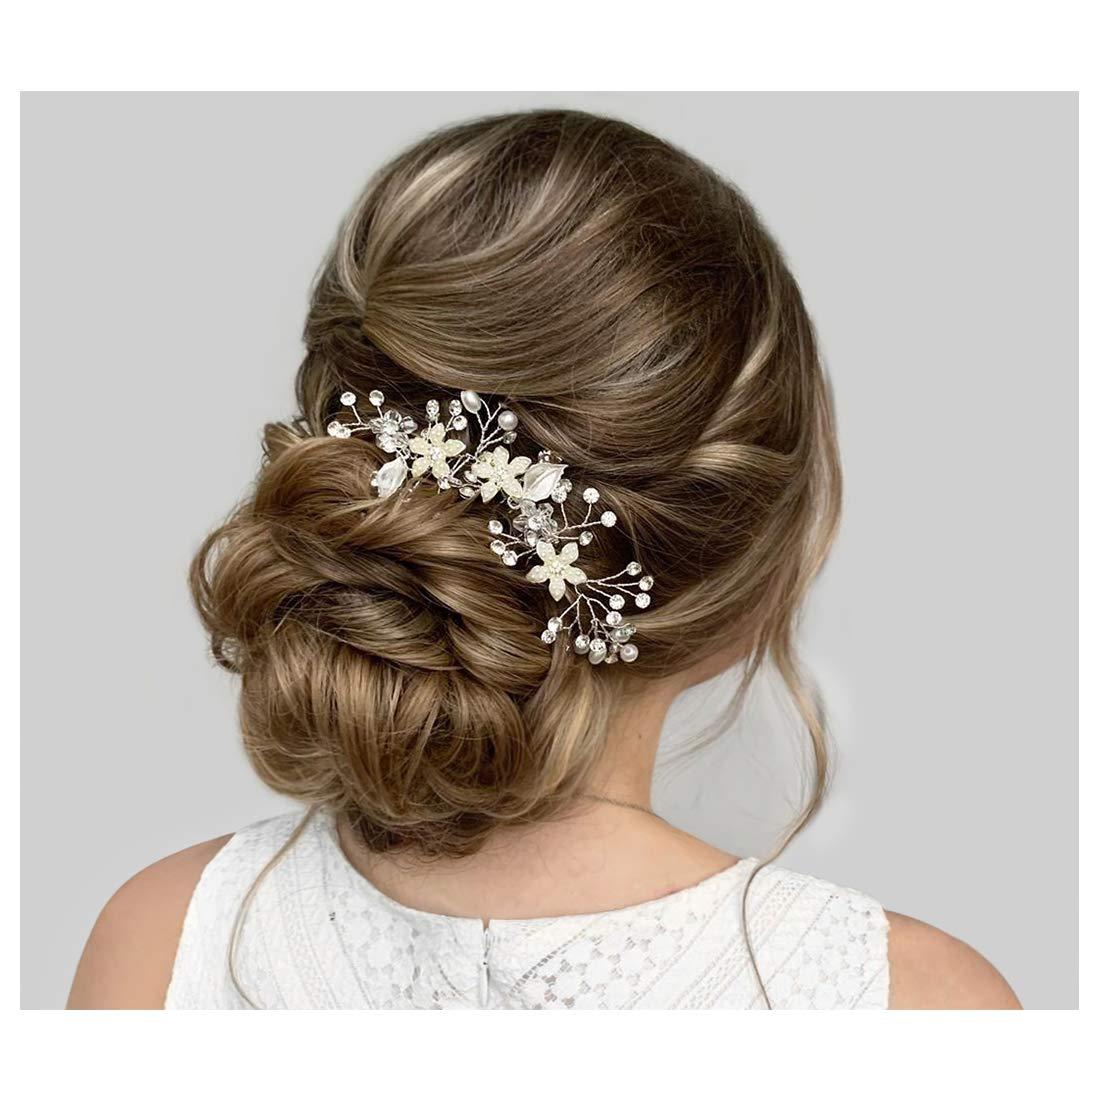 SWEETV Wedding Hair Comb Silver Pearl Flower Bridal Clip Rhinestone Hair Accessories for Bride Women by SWEETV